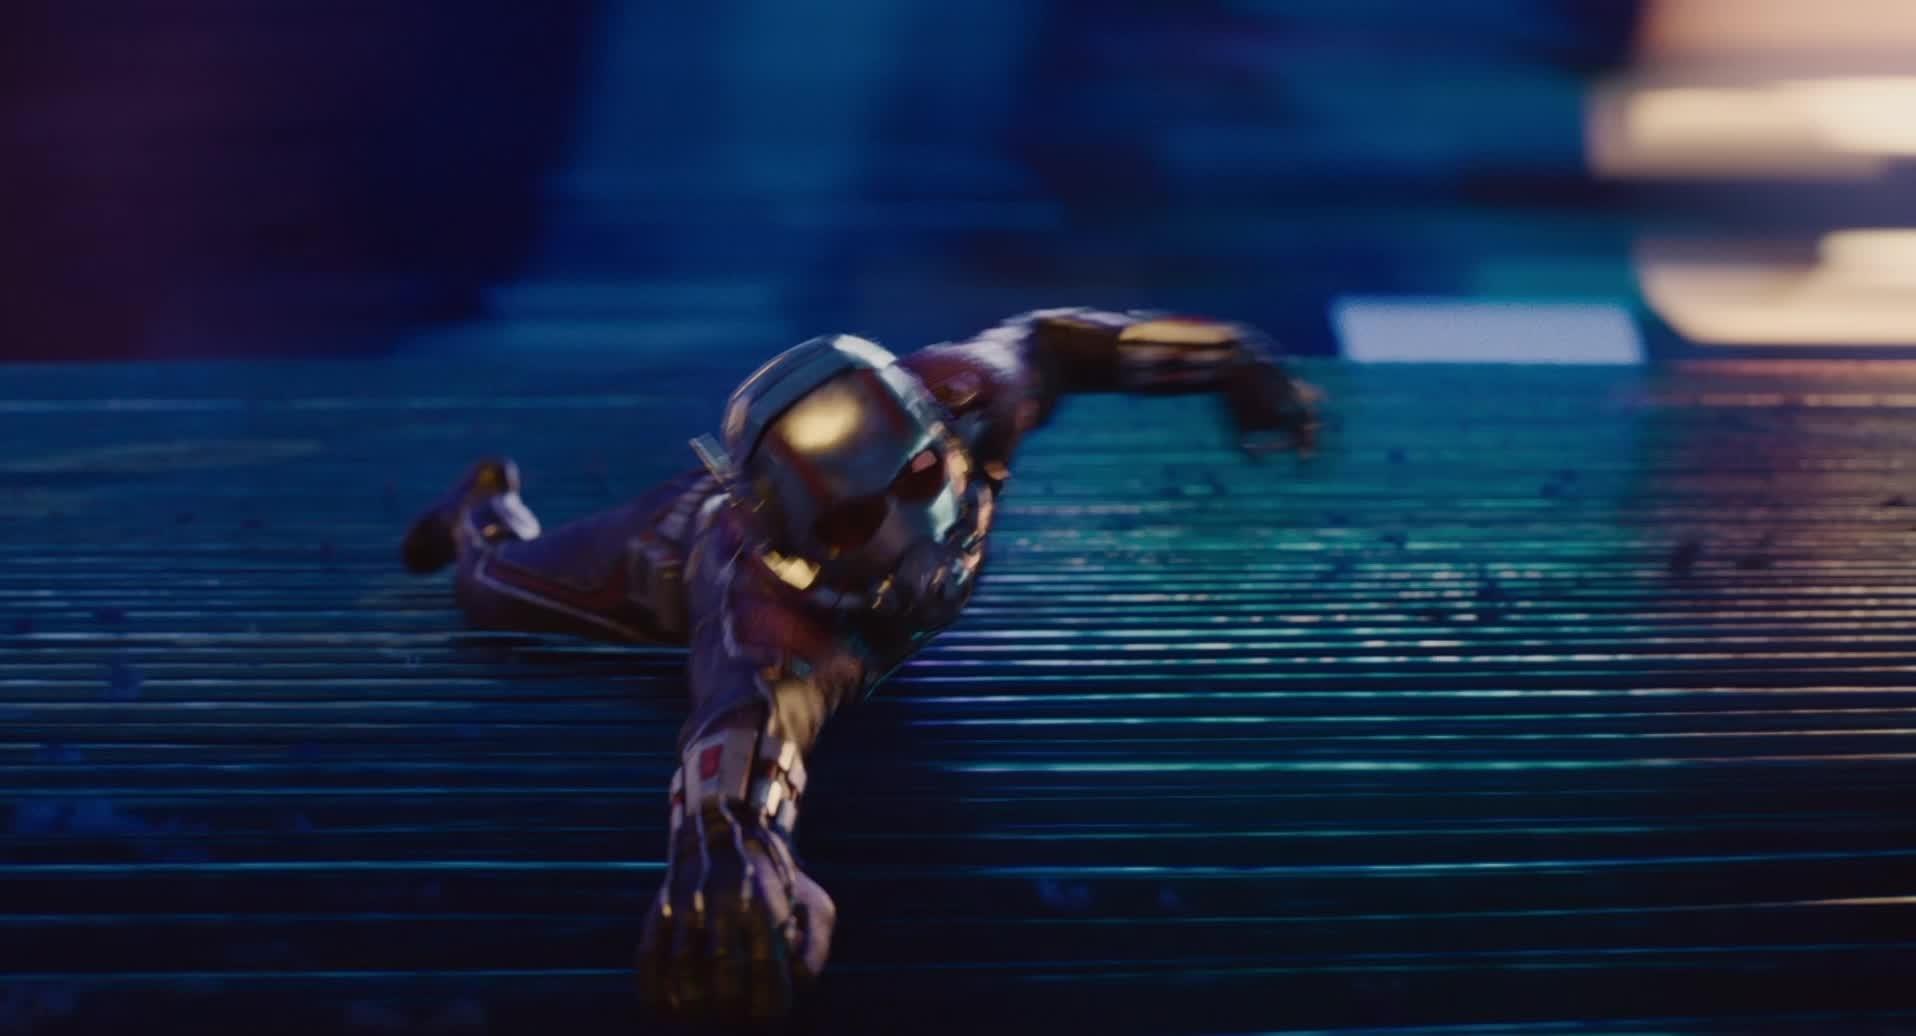 Marvel's Ant-Man - Sulla pista